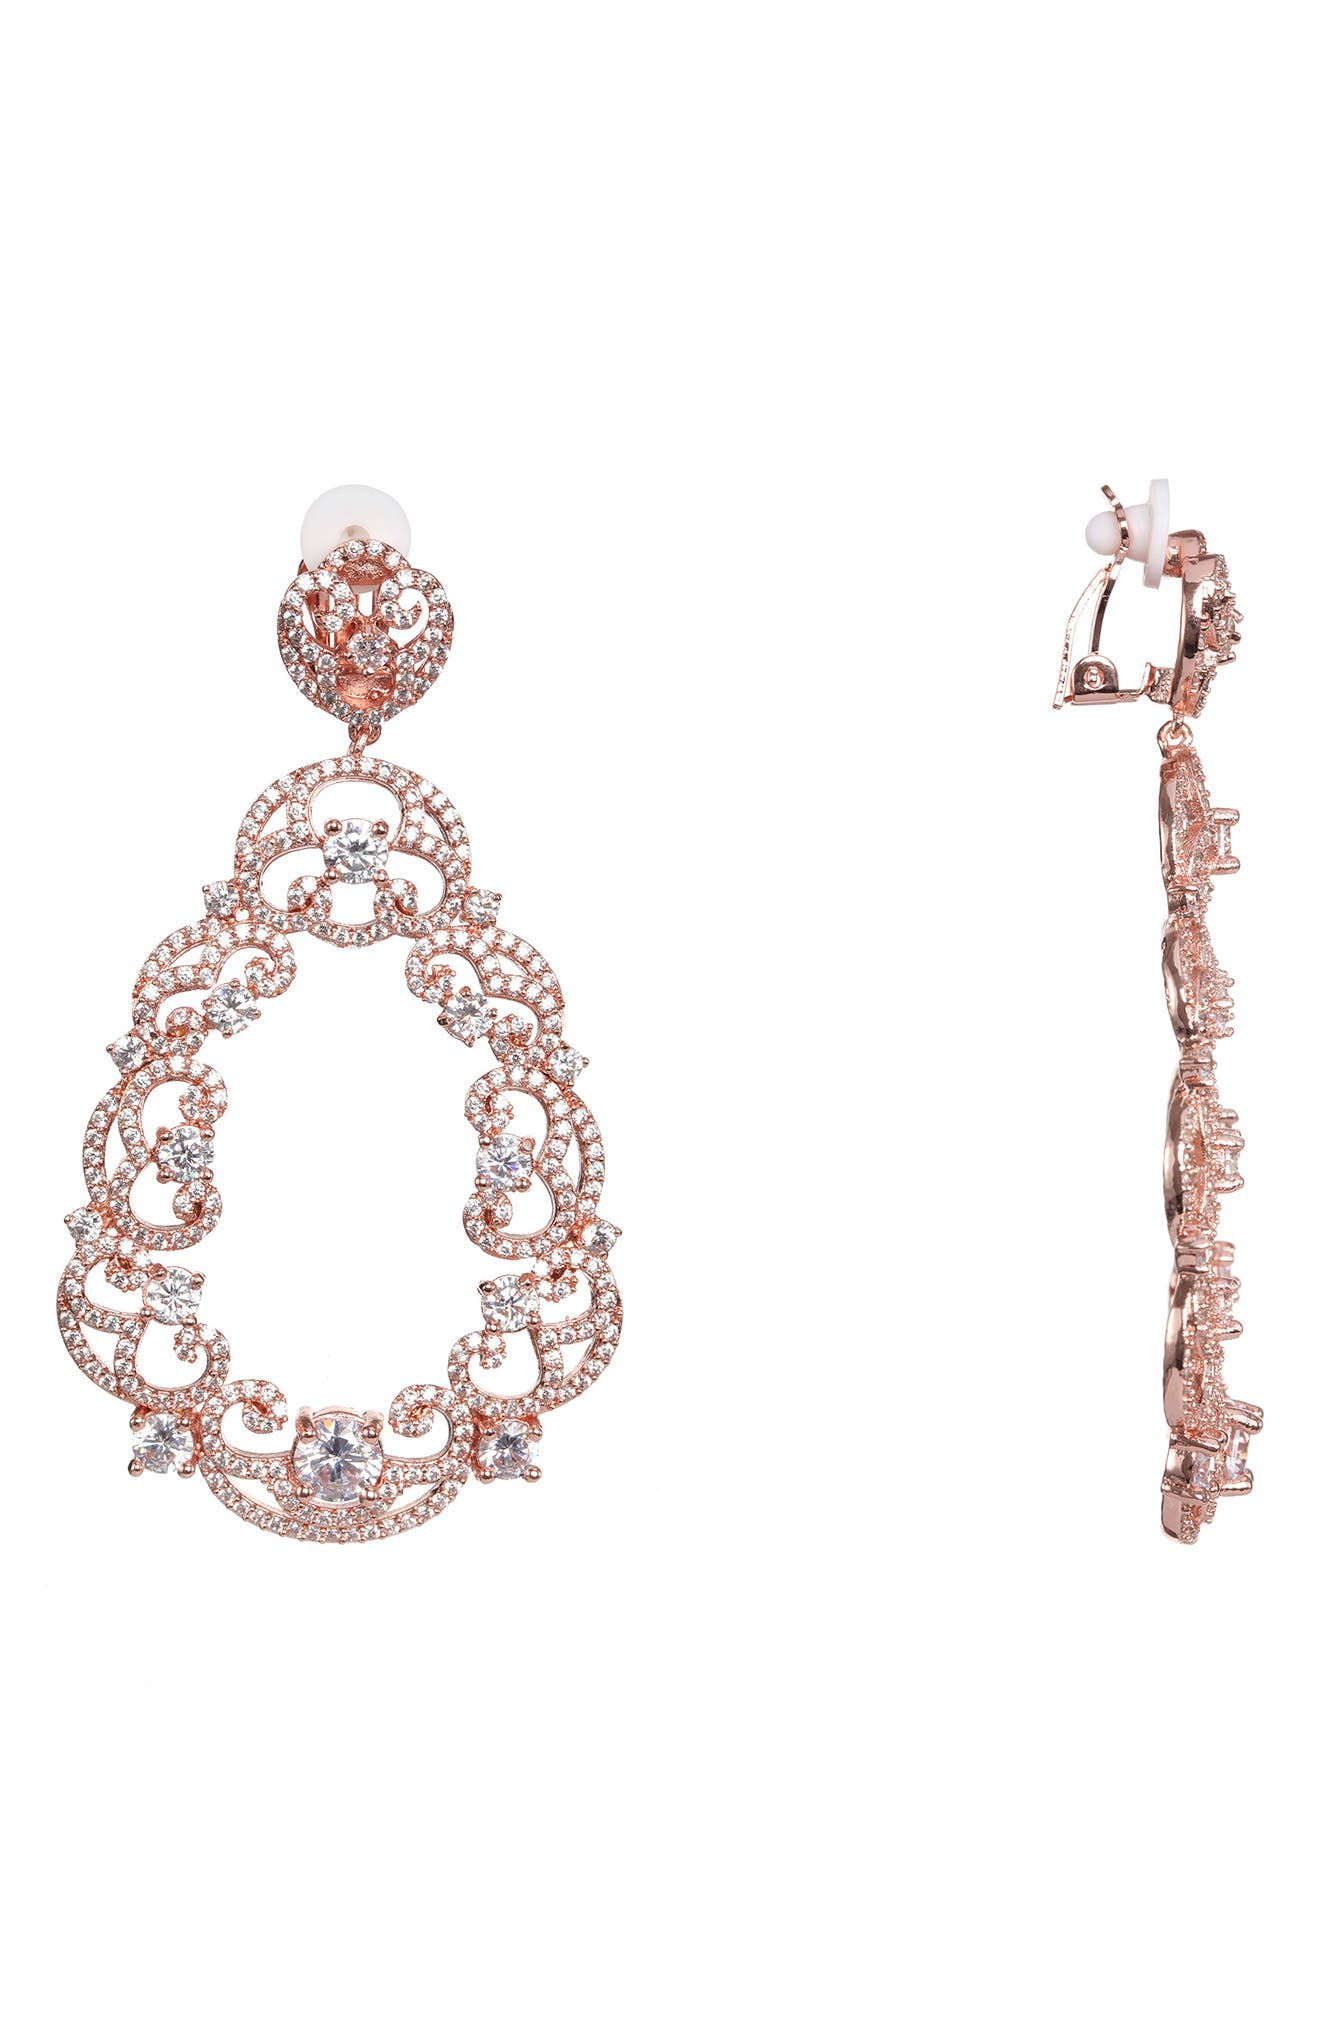 Scroll Pavé Earrings,                             Main thumbnail 1, color,                             White/ Rose Gold